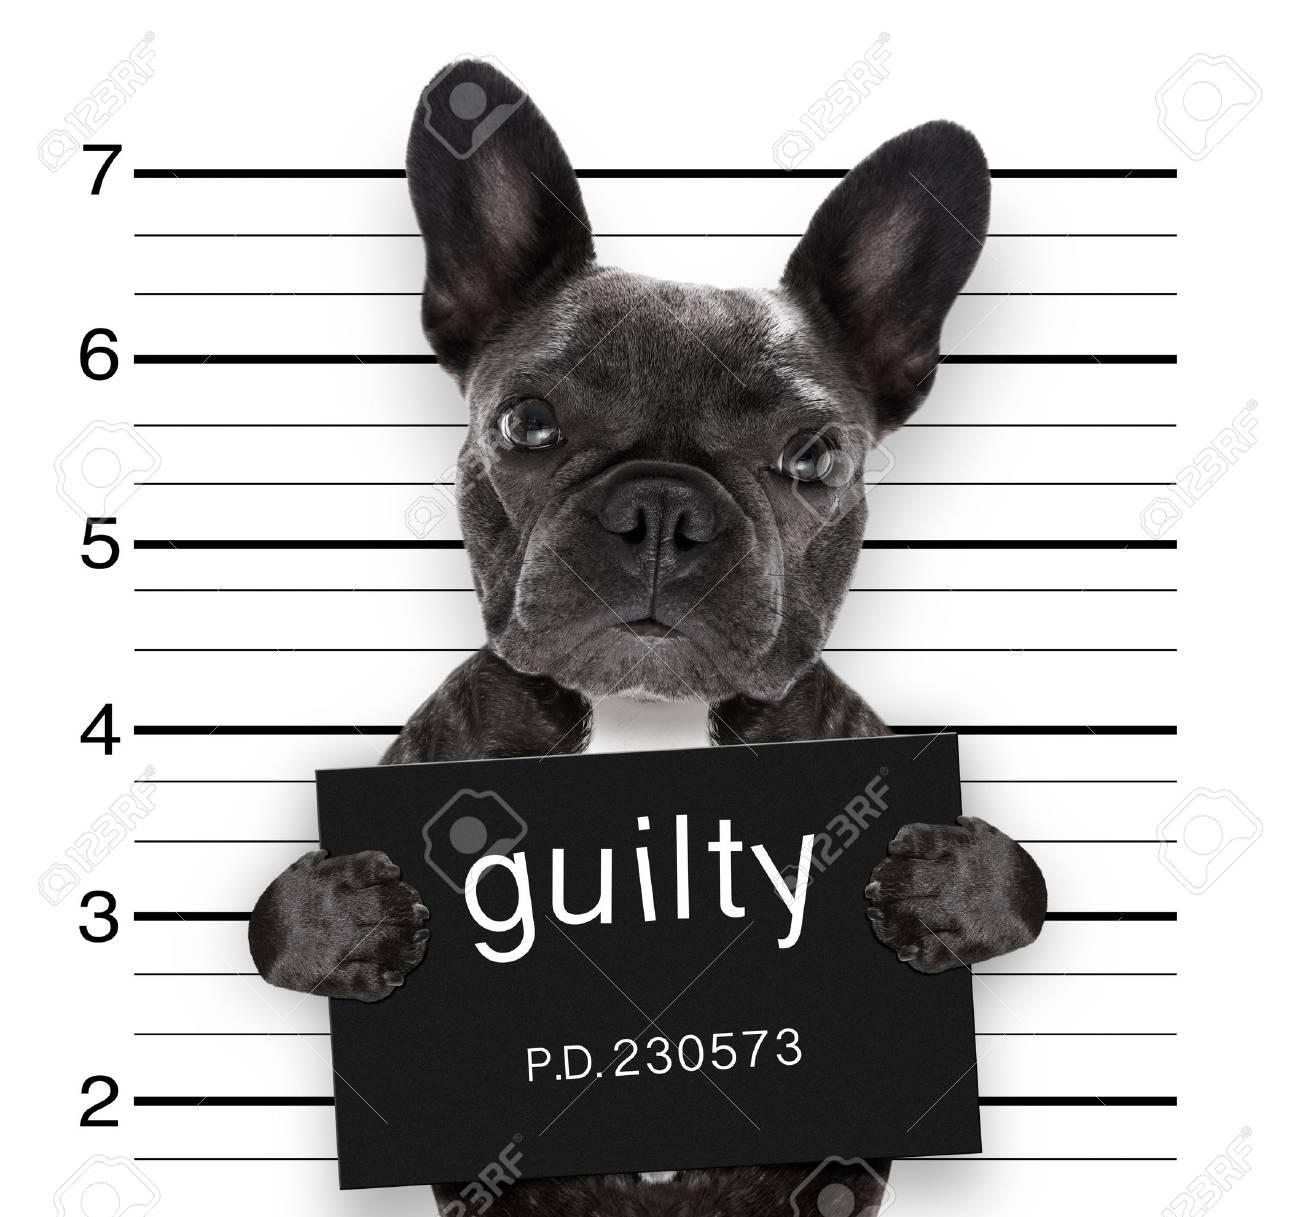 criminal mugshot of french bulldog dog at police station holding guilty placard , isolated on background - 87239172